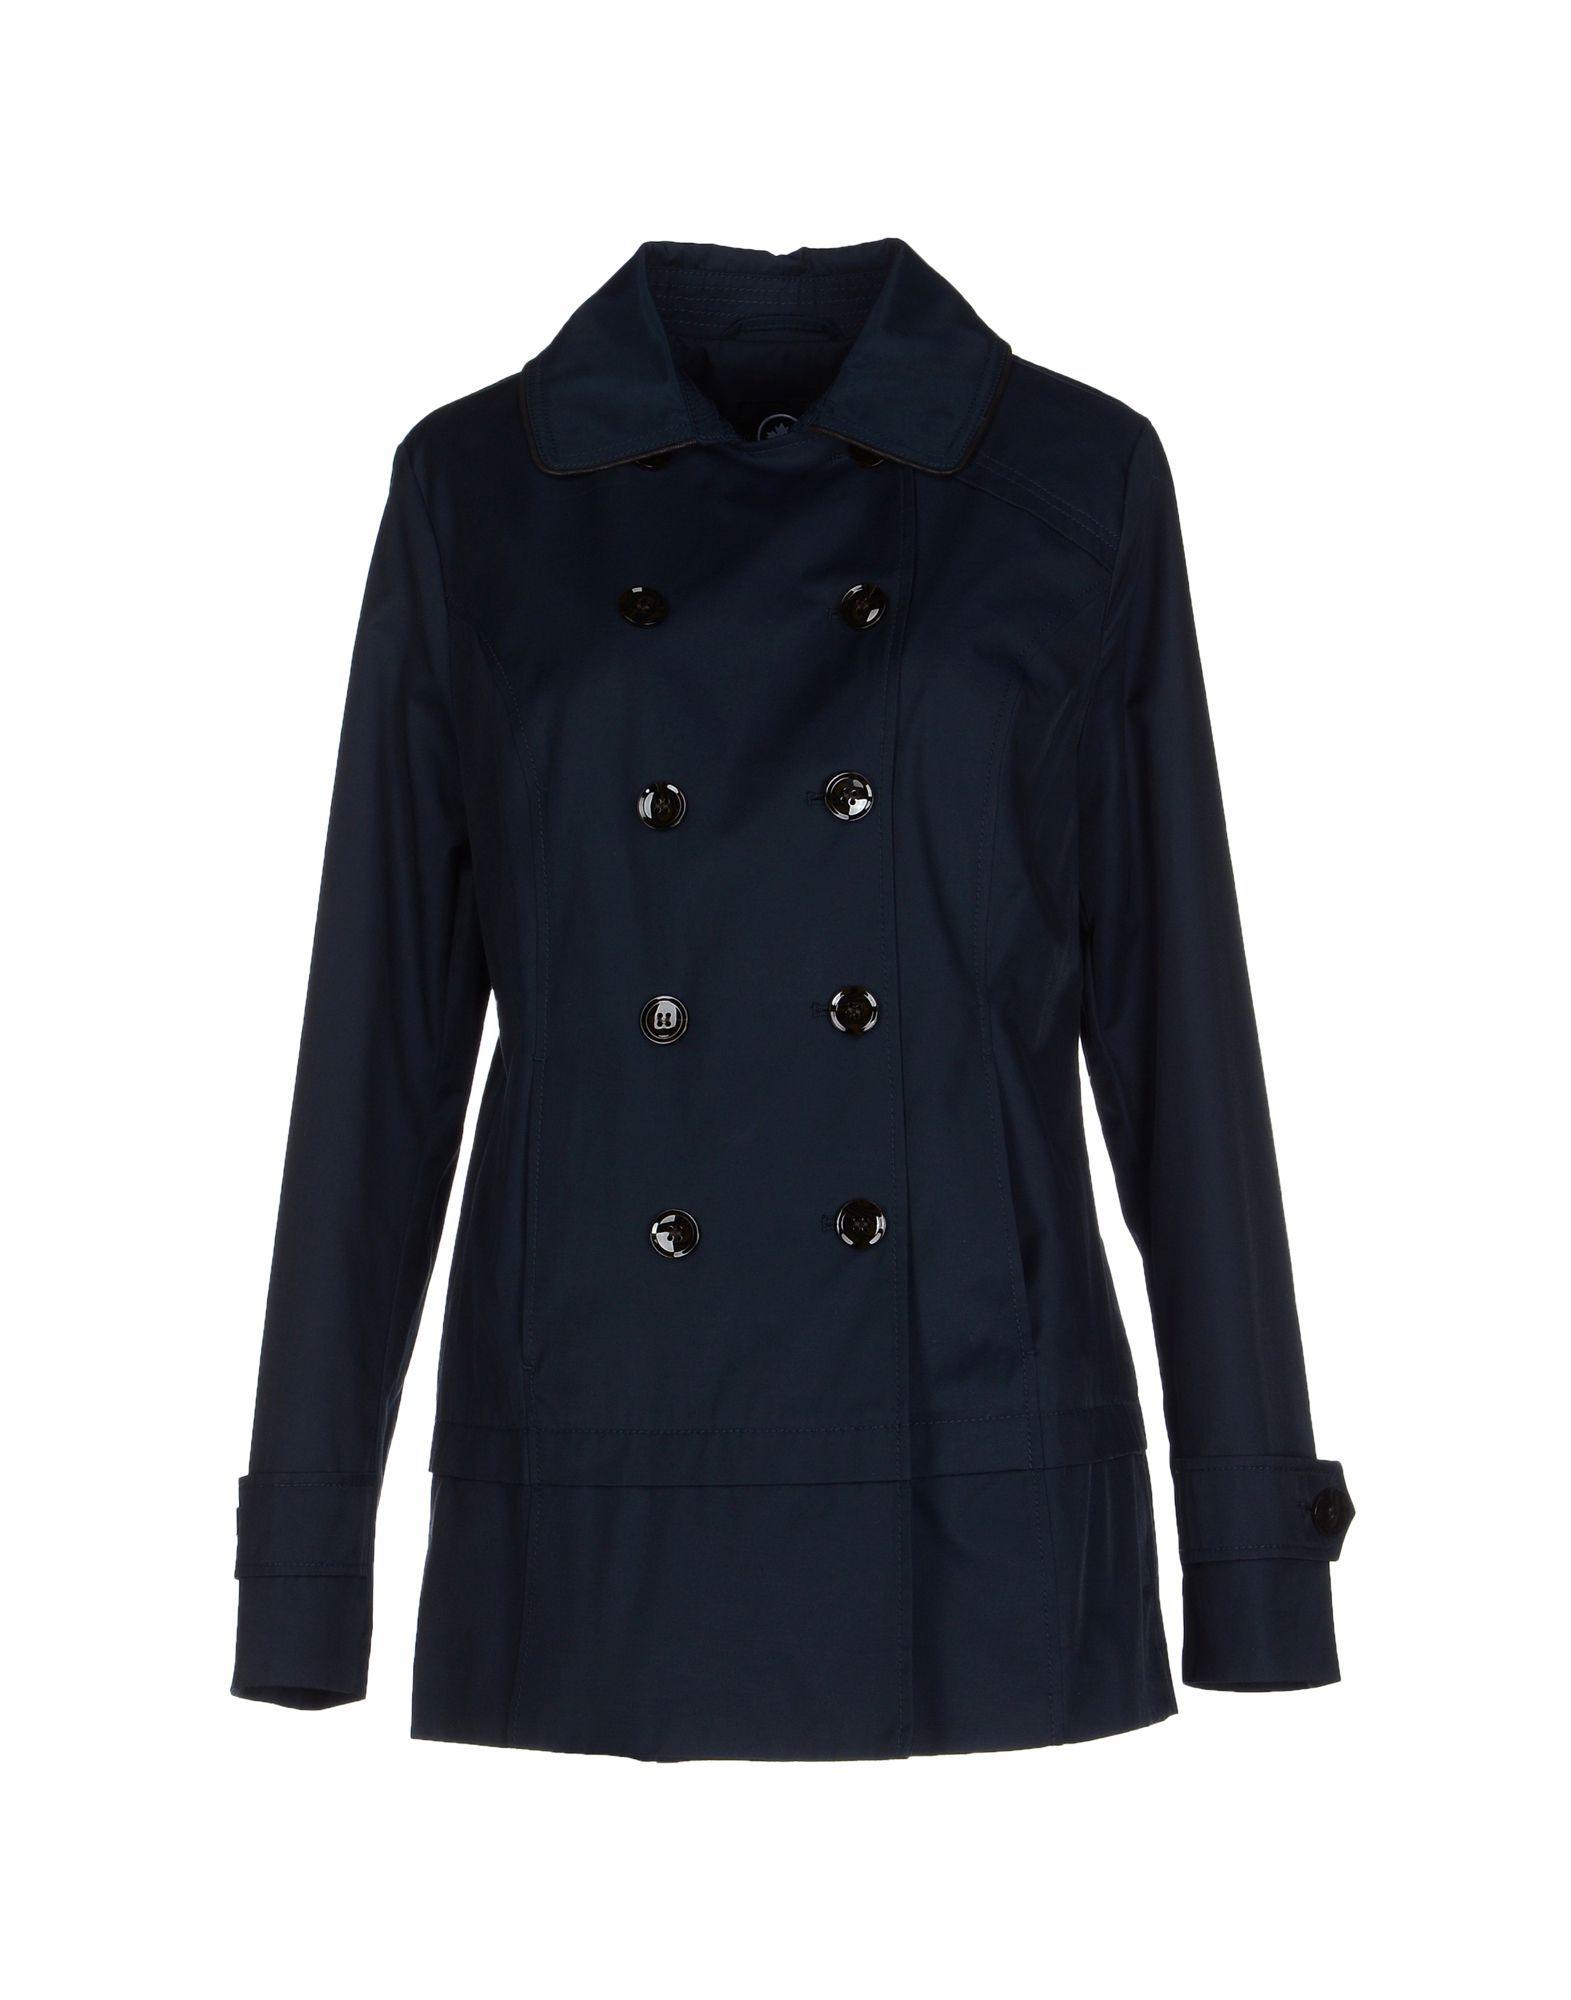 Halifax Traders - Легкое Пальто Для Женщин - Легкие Пальто Halifax Traders на YOOX